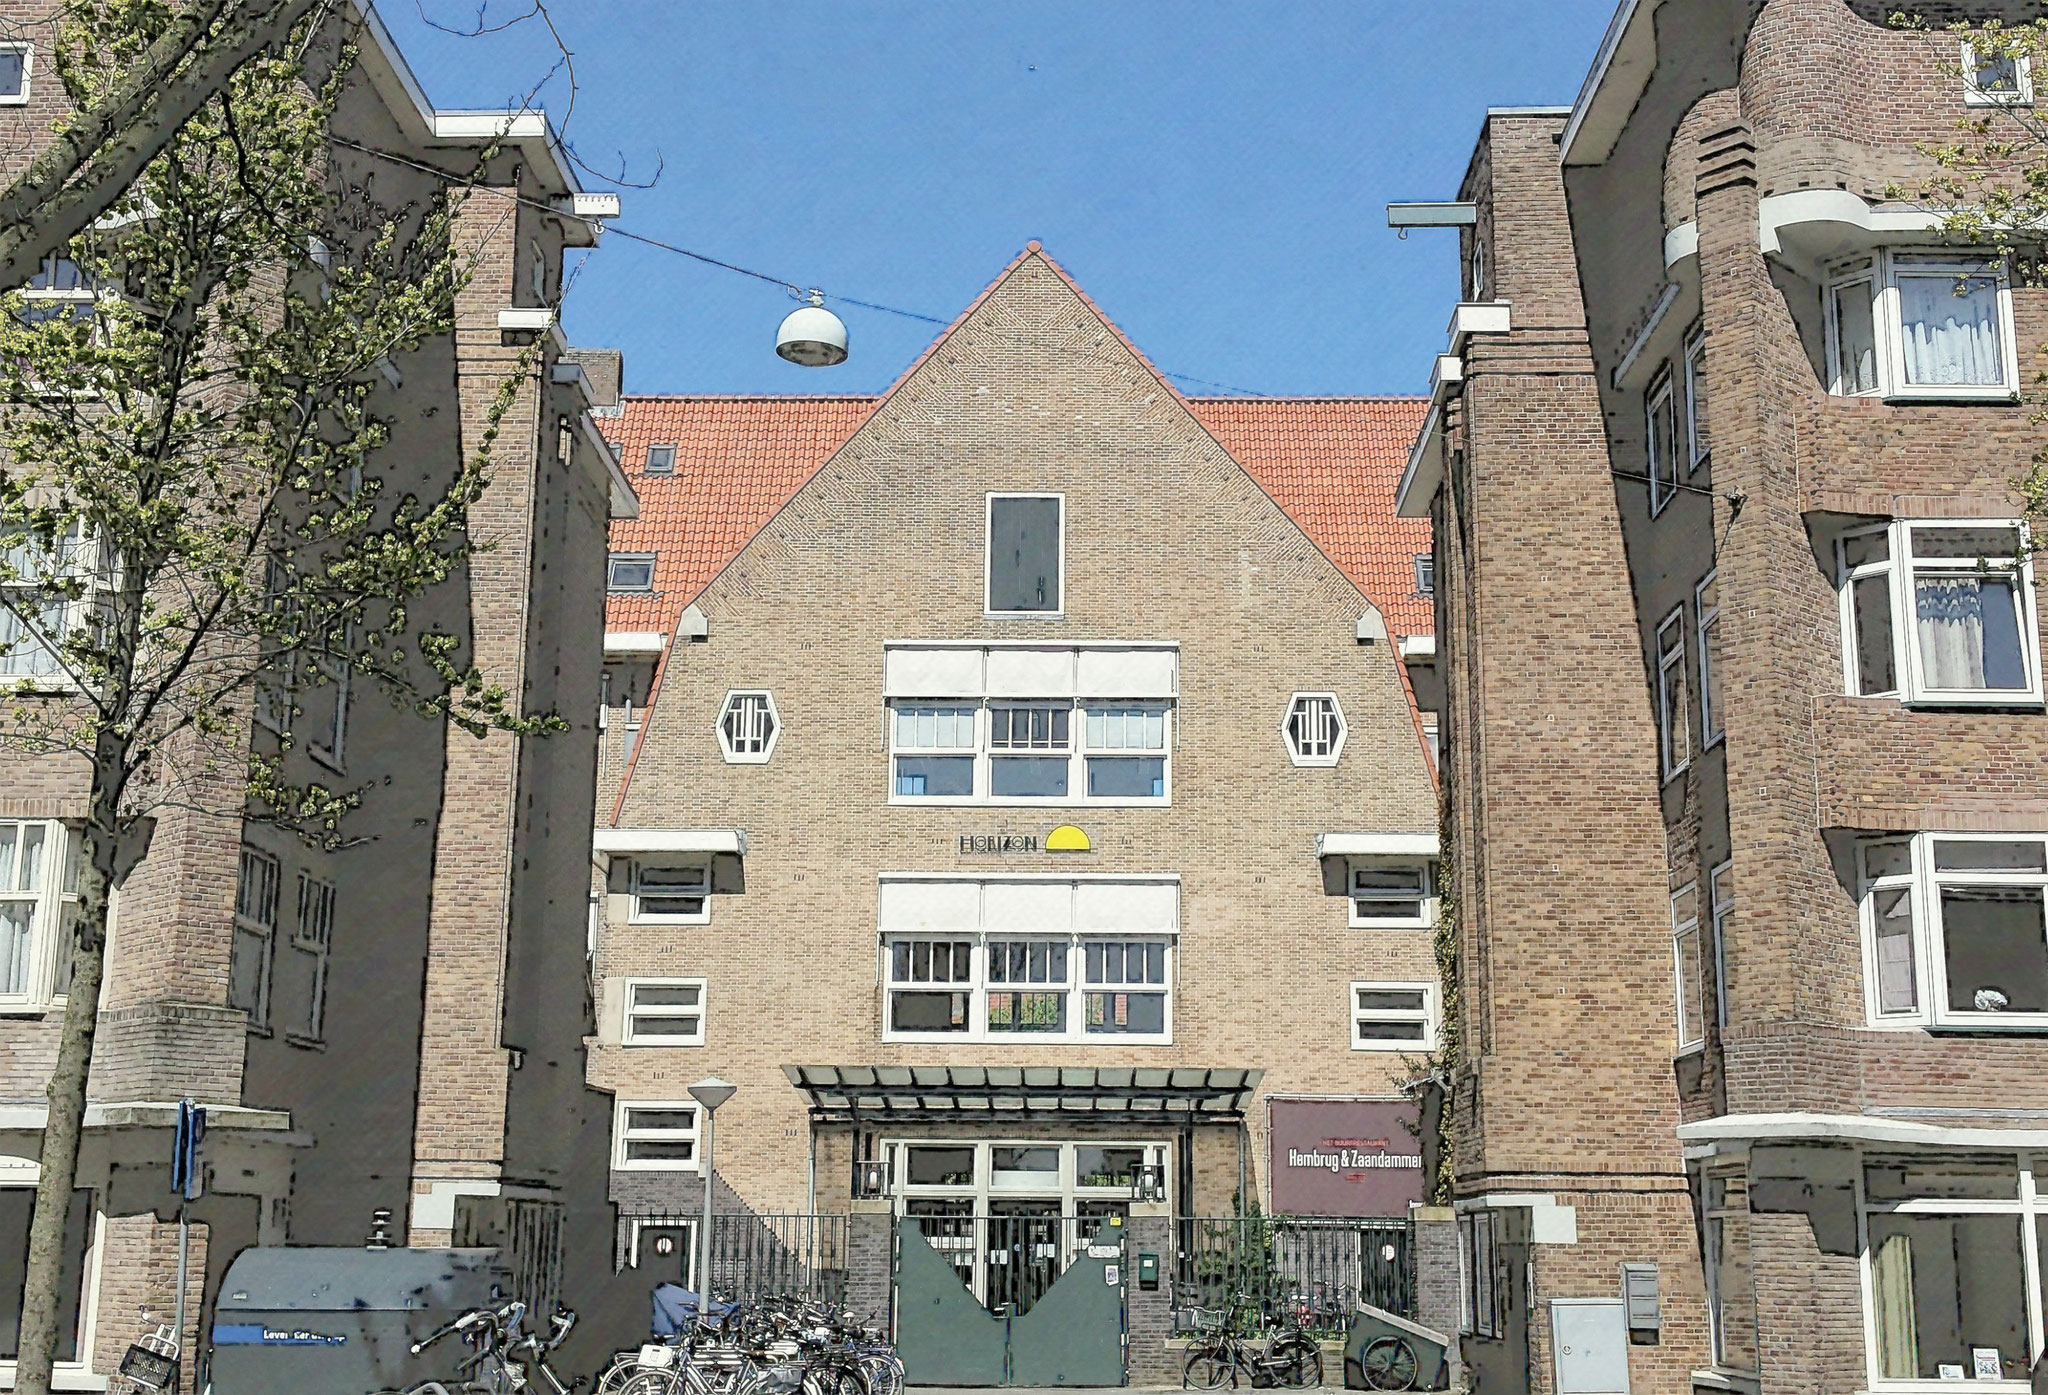 Hemburgstraat